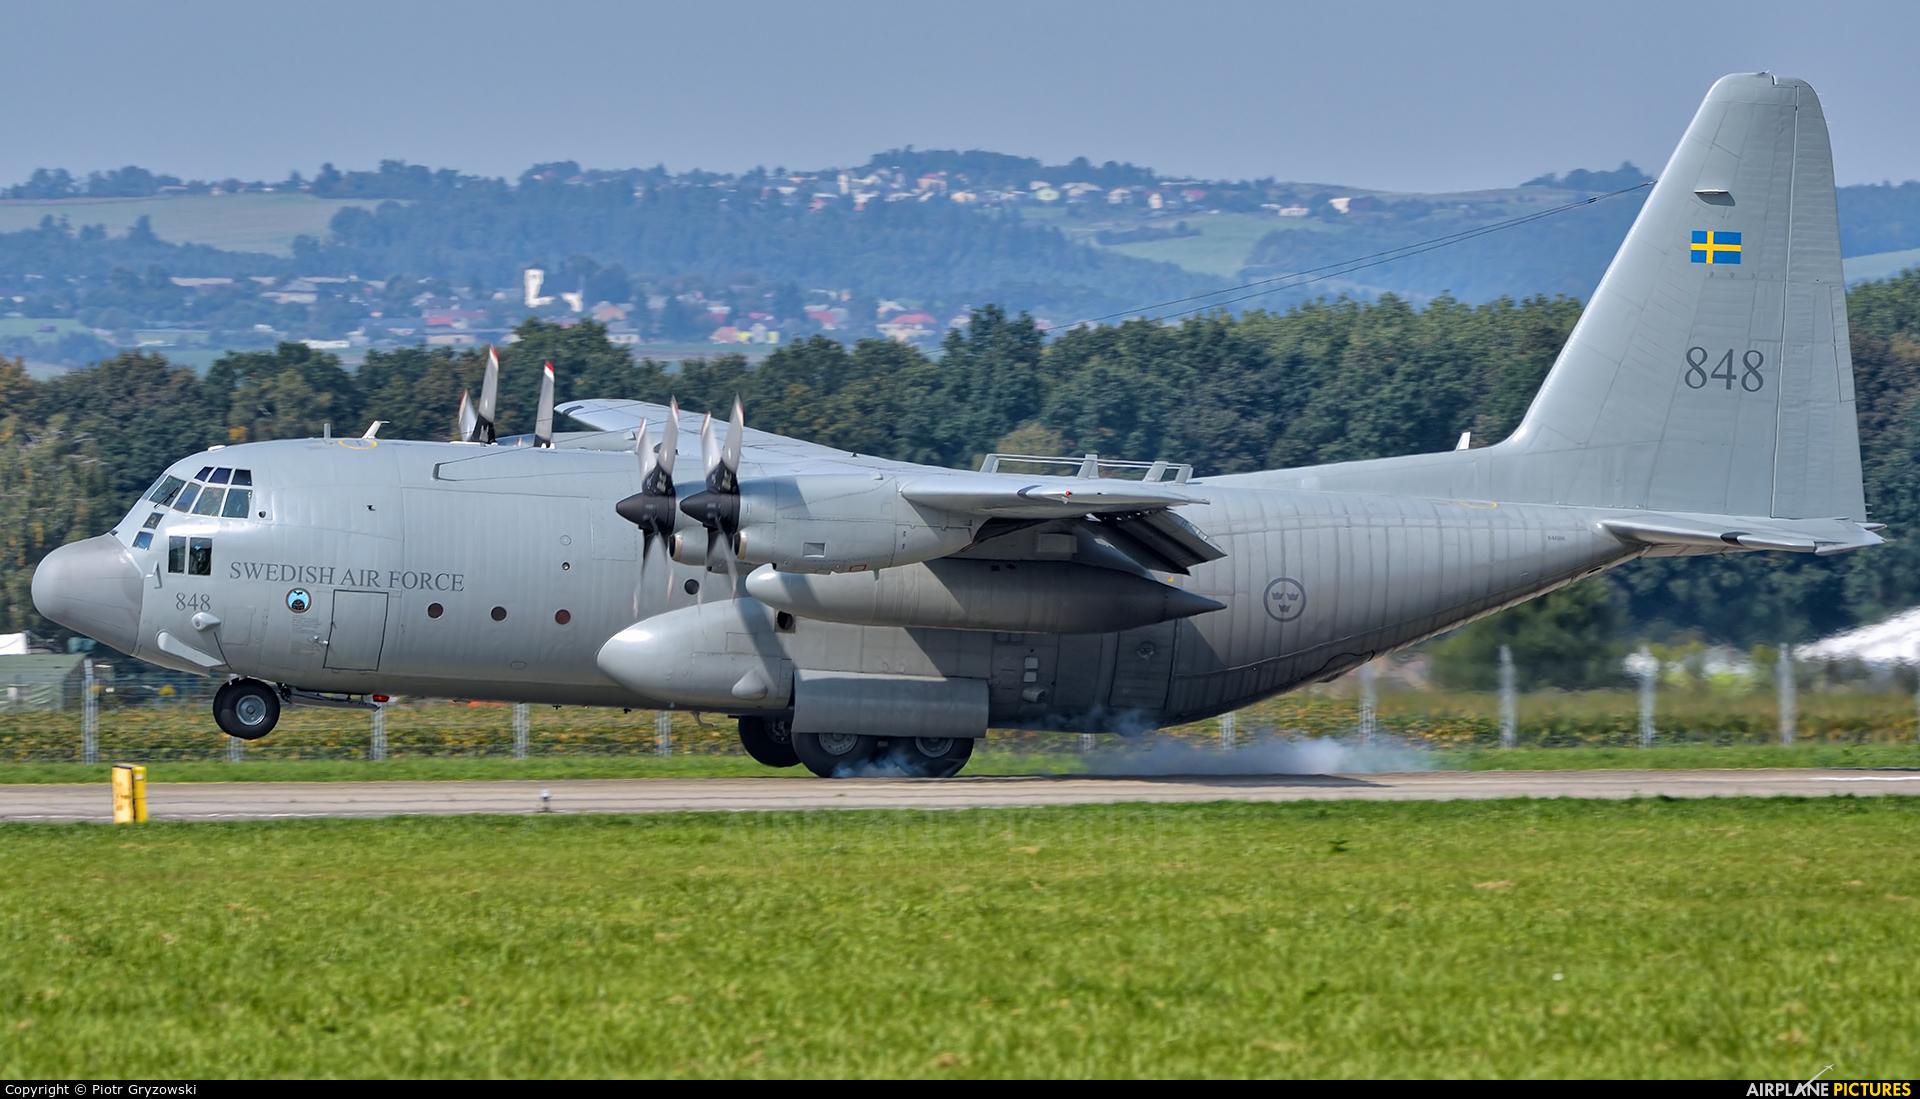 Sweden - Air Force 848 aircraft at Ostrava Mošnov